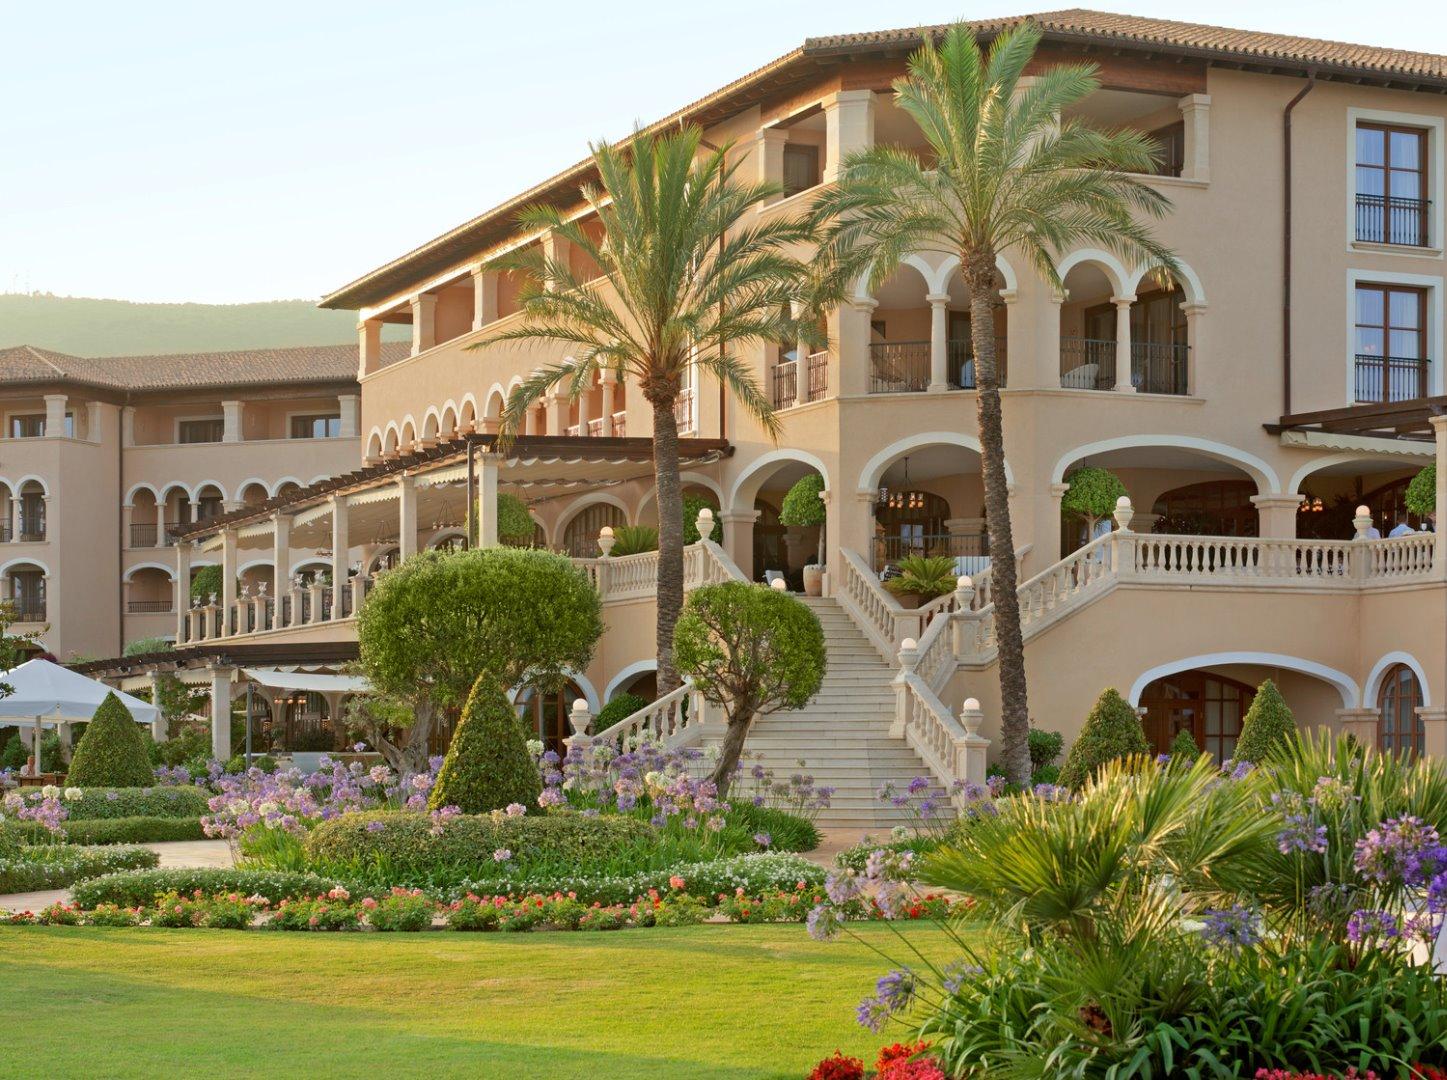 Meeressandpeeling: Foto vom Wellnesshotel The St. Regis Mardavall Mallorca | Wellness Mallorca